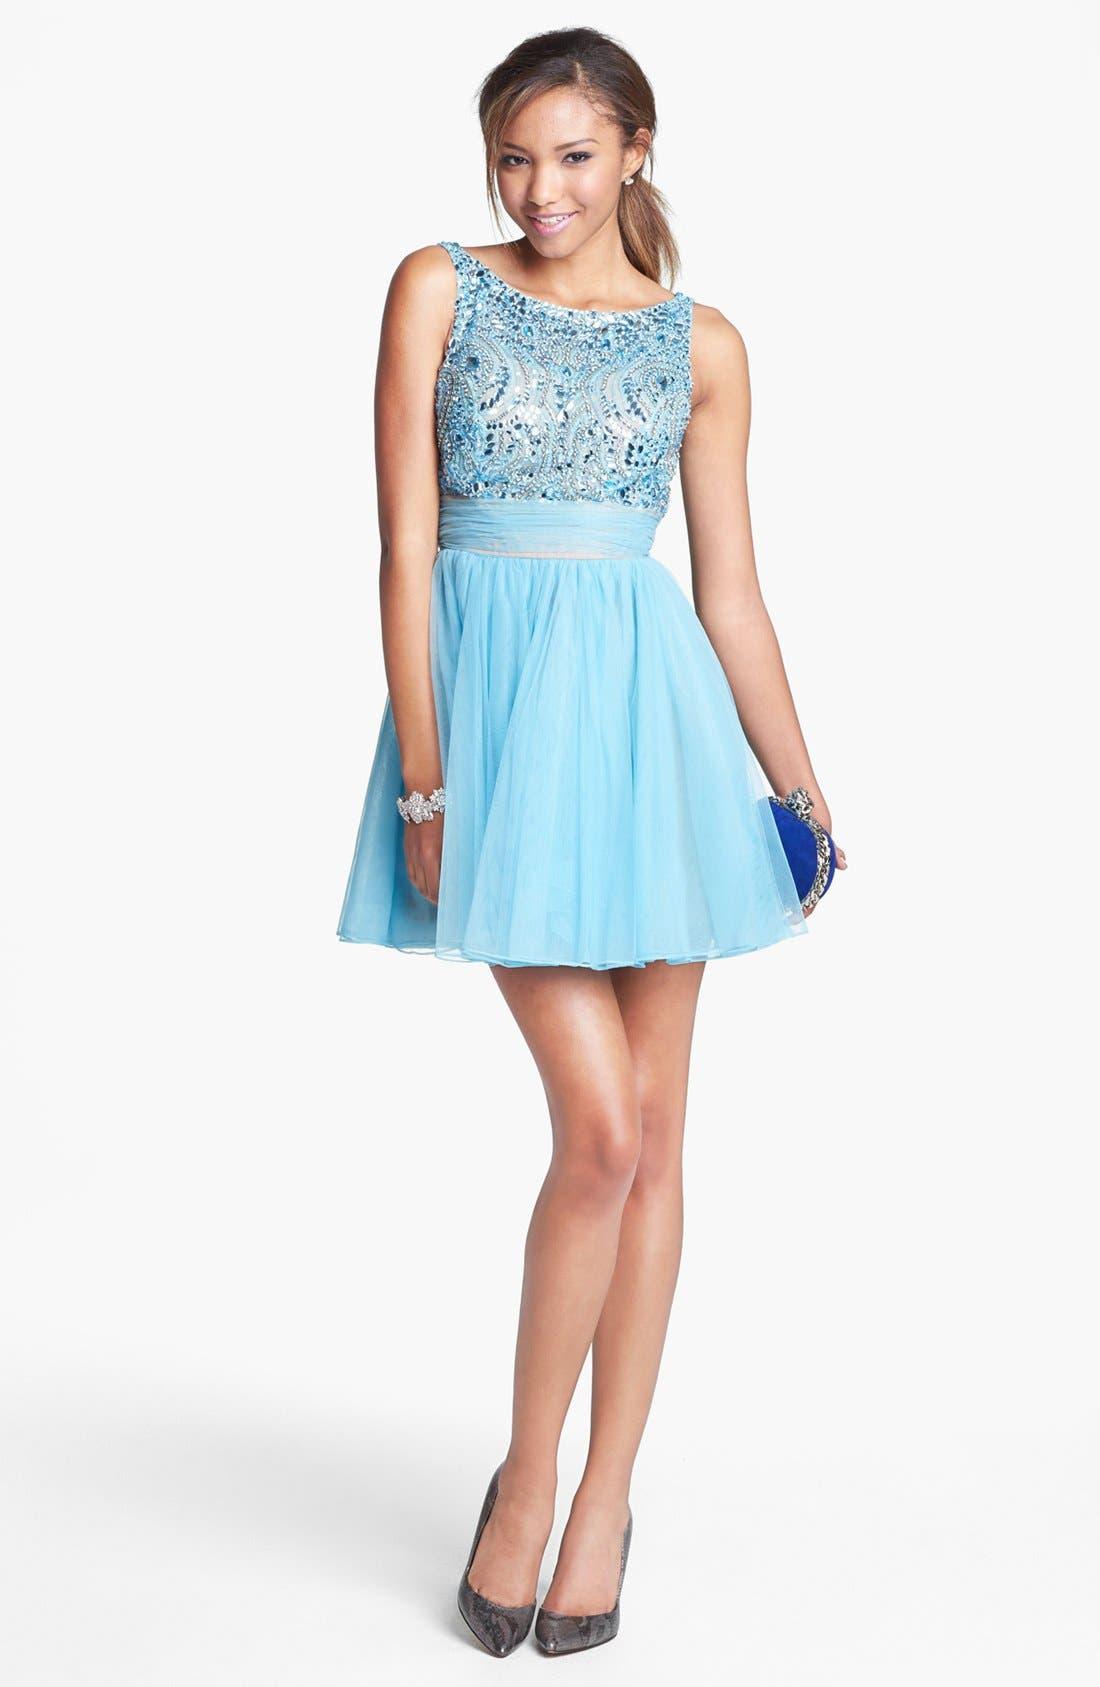 Main Image - Sherri Hill Embellished Tulle Fit & Flare Dress